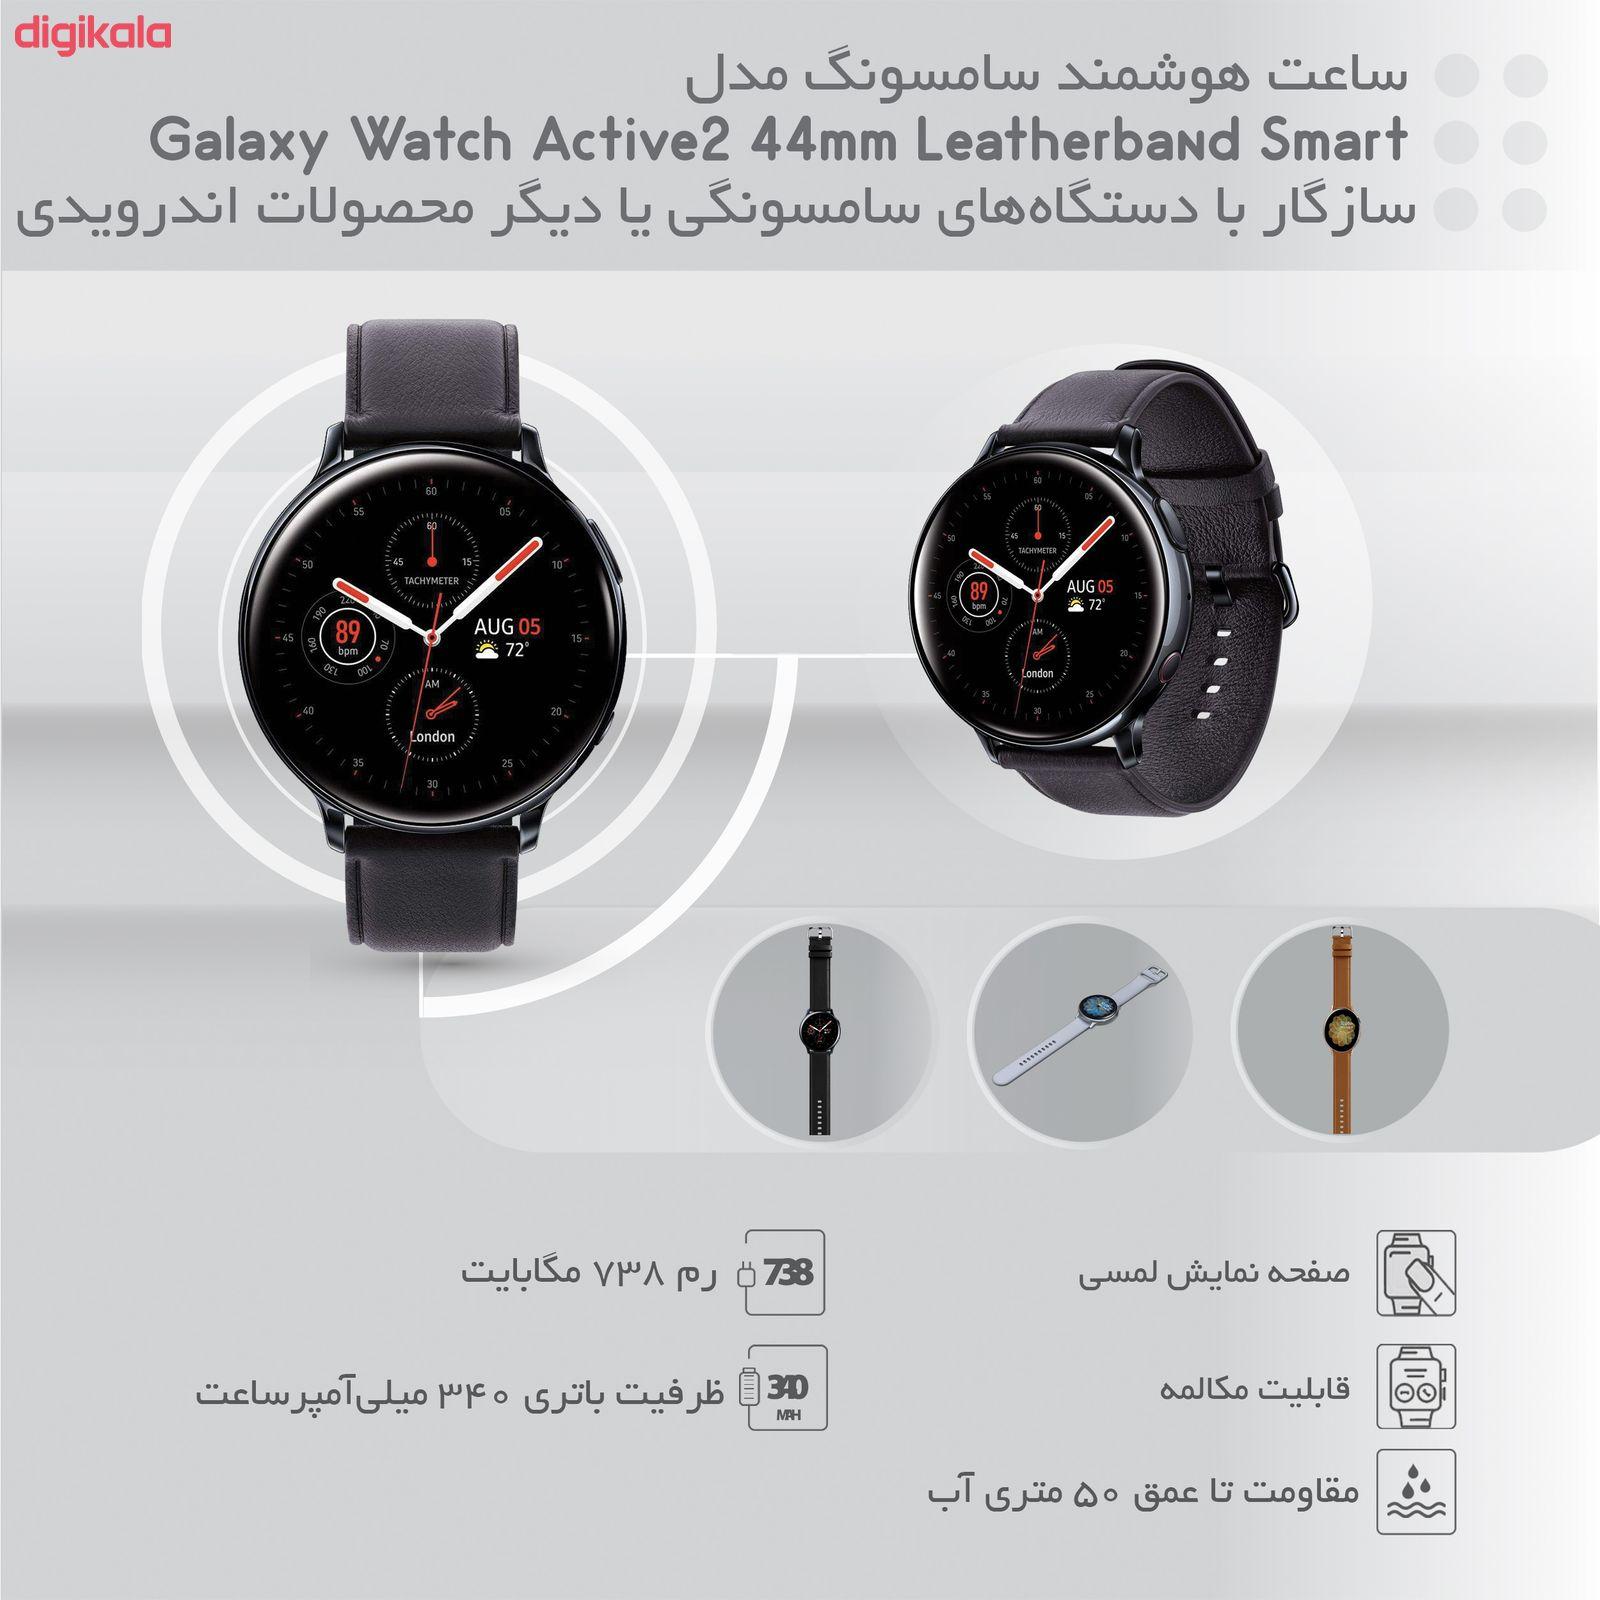 ساعت هوشمند سامسونگ مدل Galaxy Watch Active2 44mm Leatherband Smart main 1 12